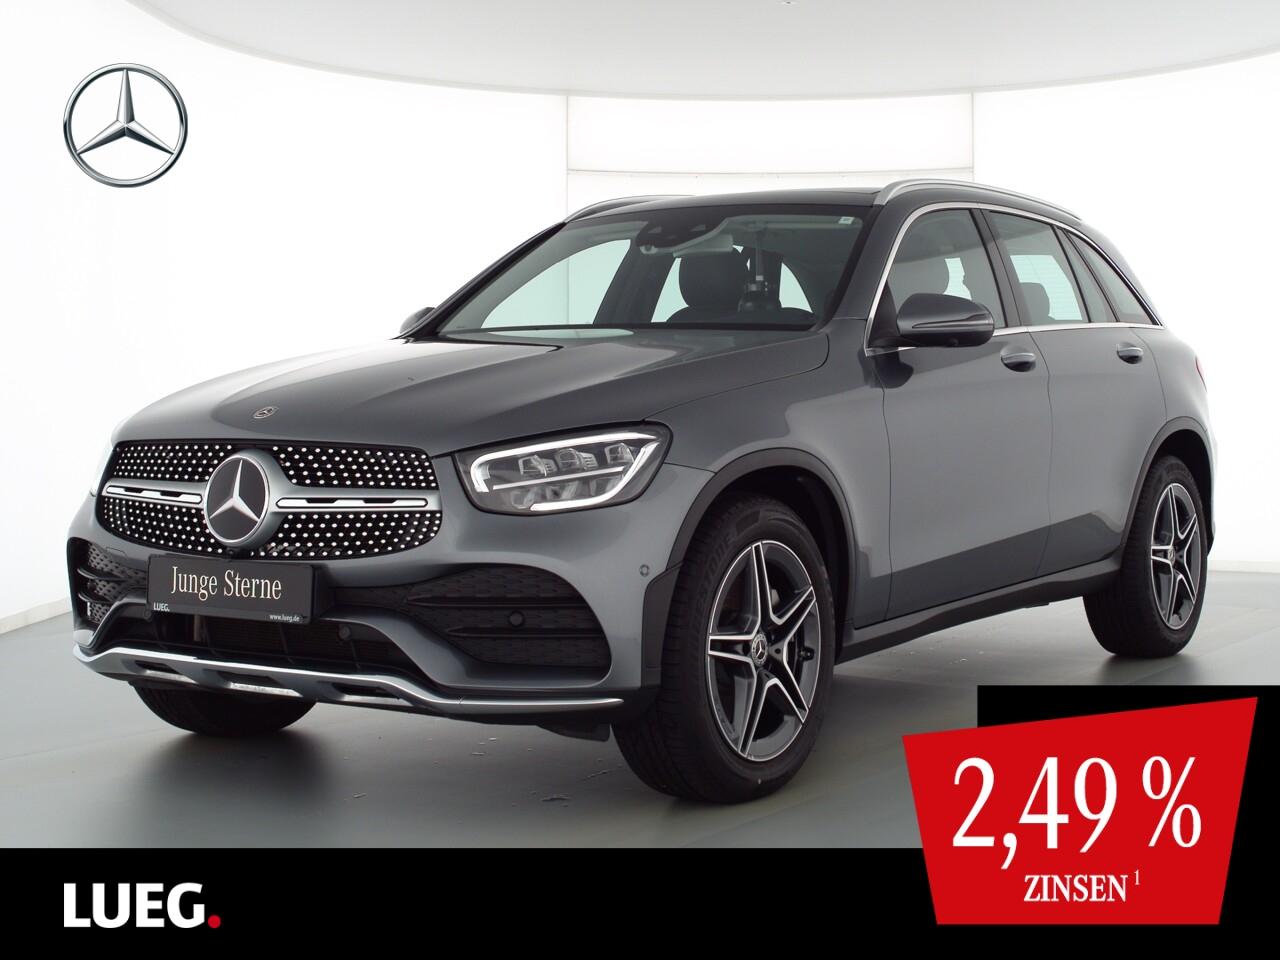 Mercedes-Benz GLC 220 d 4M AMG+MBUX+Pano+Burm+LED+19''+AHK+360, Jahr 2020, Diesel